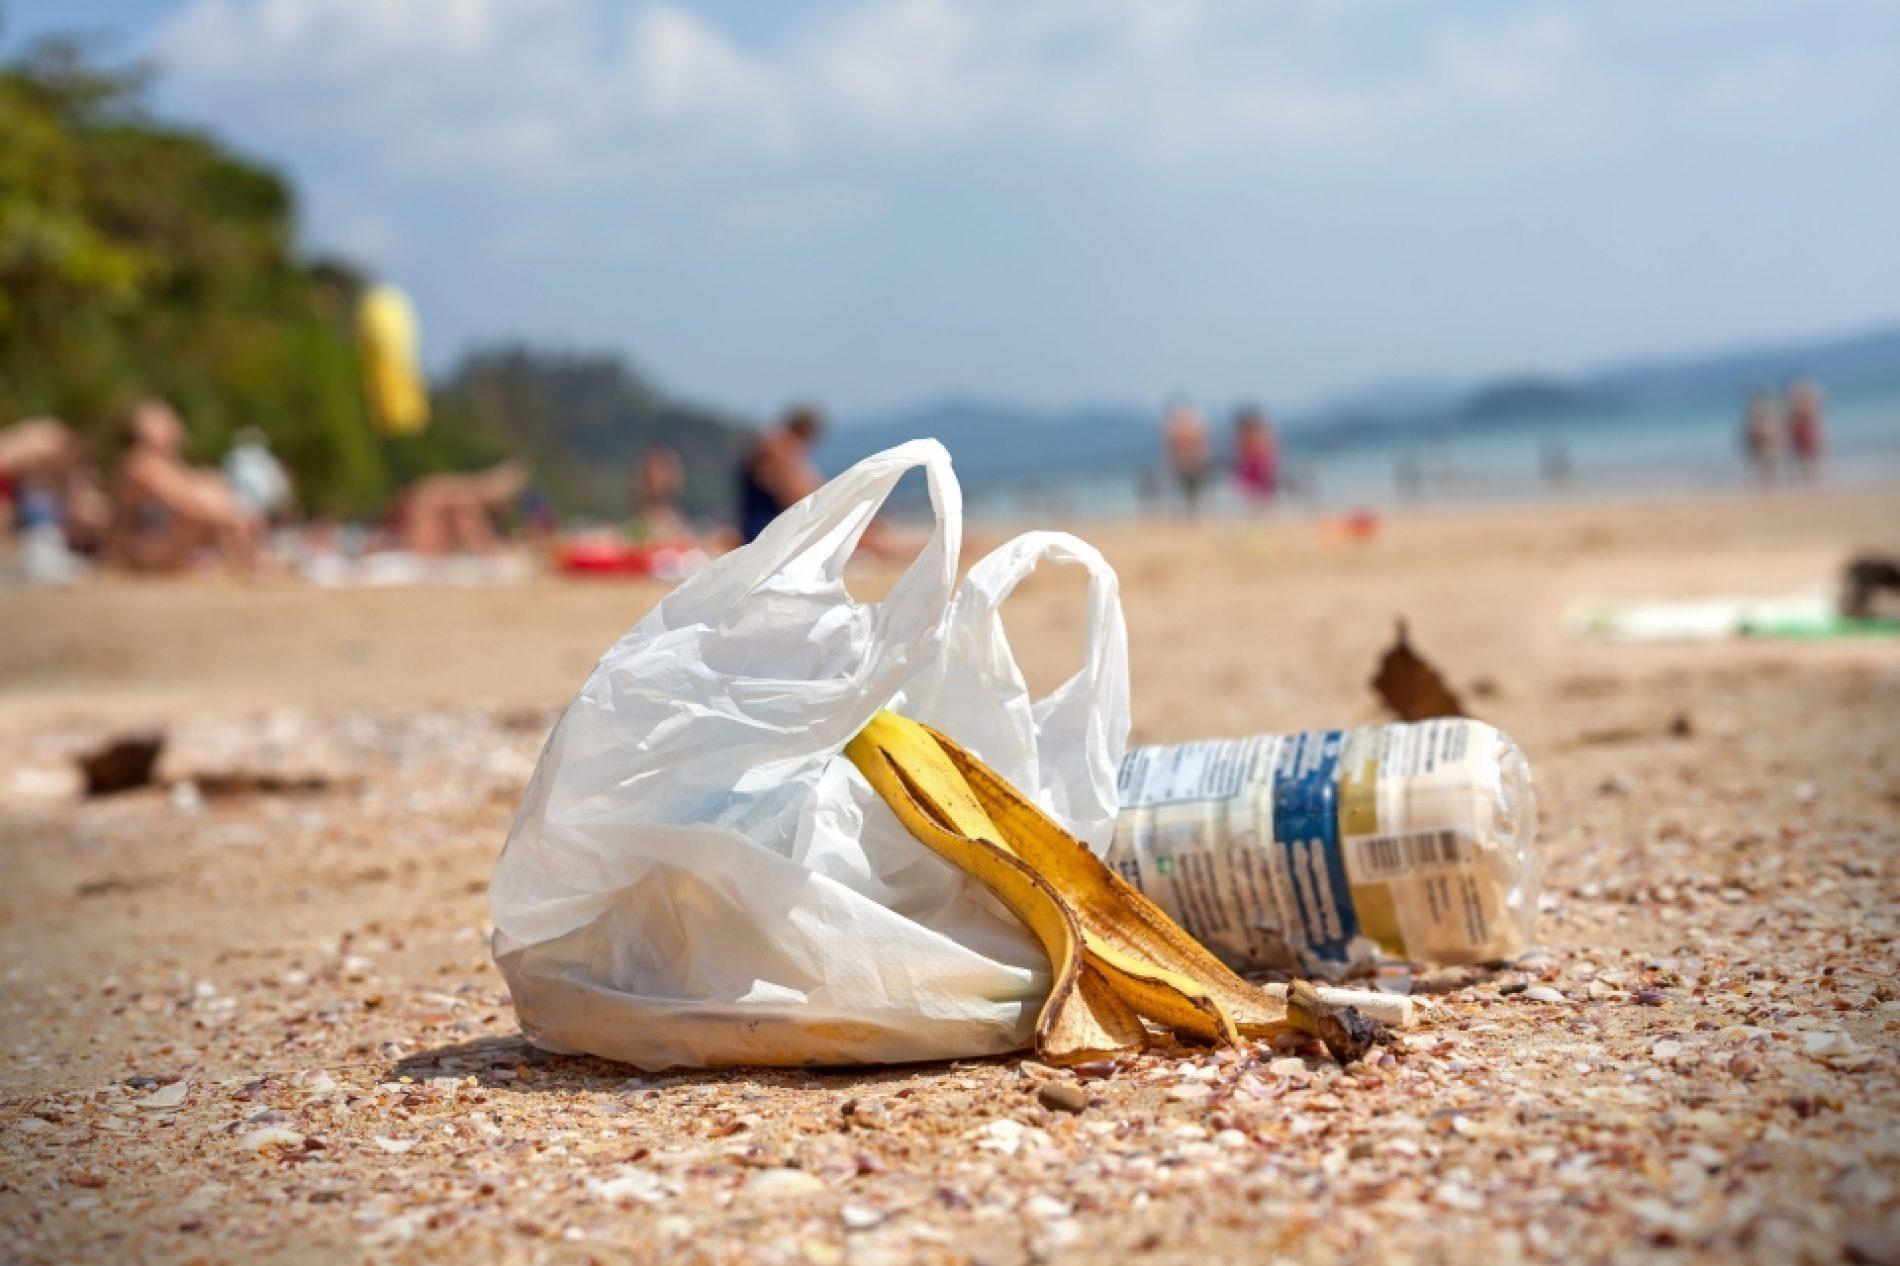 Tanzanie – Environnement: EcoAct redonne une seconde vie au plastique